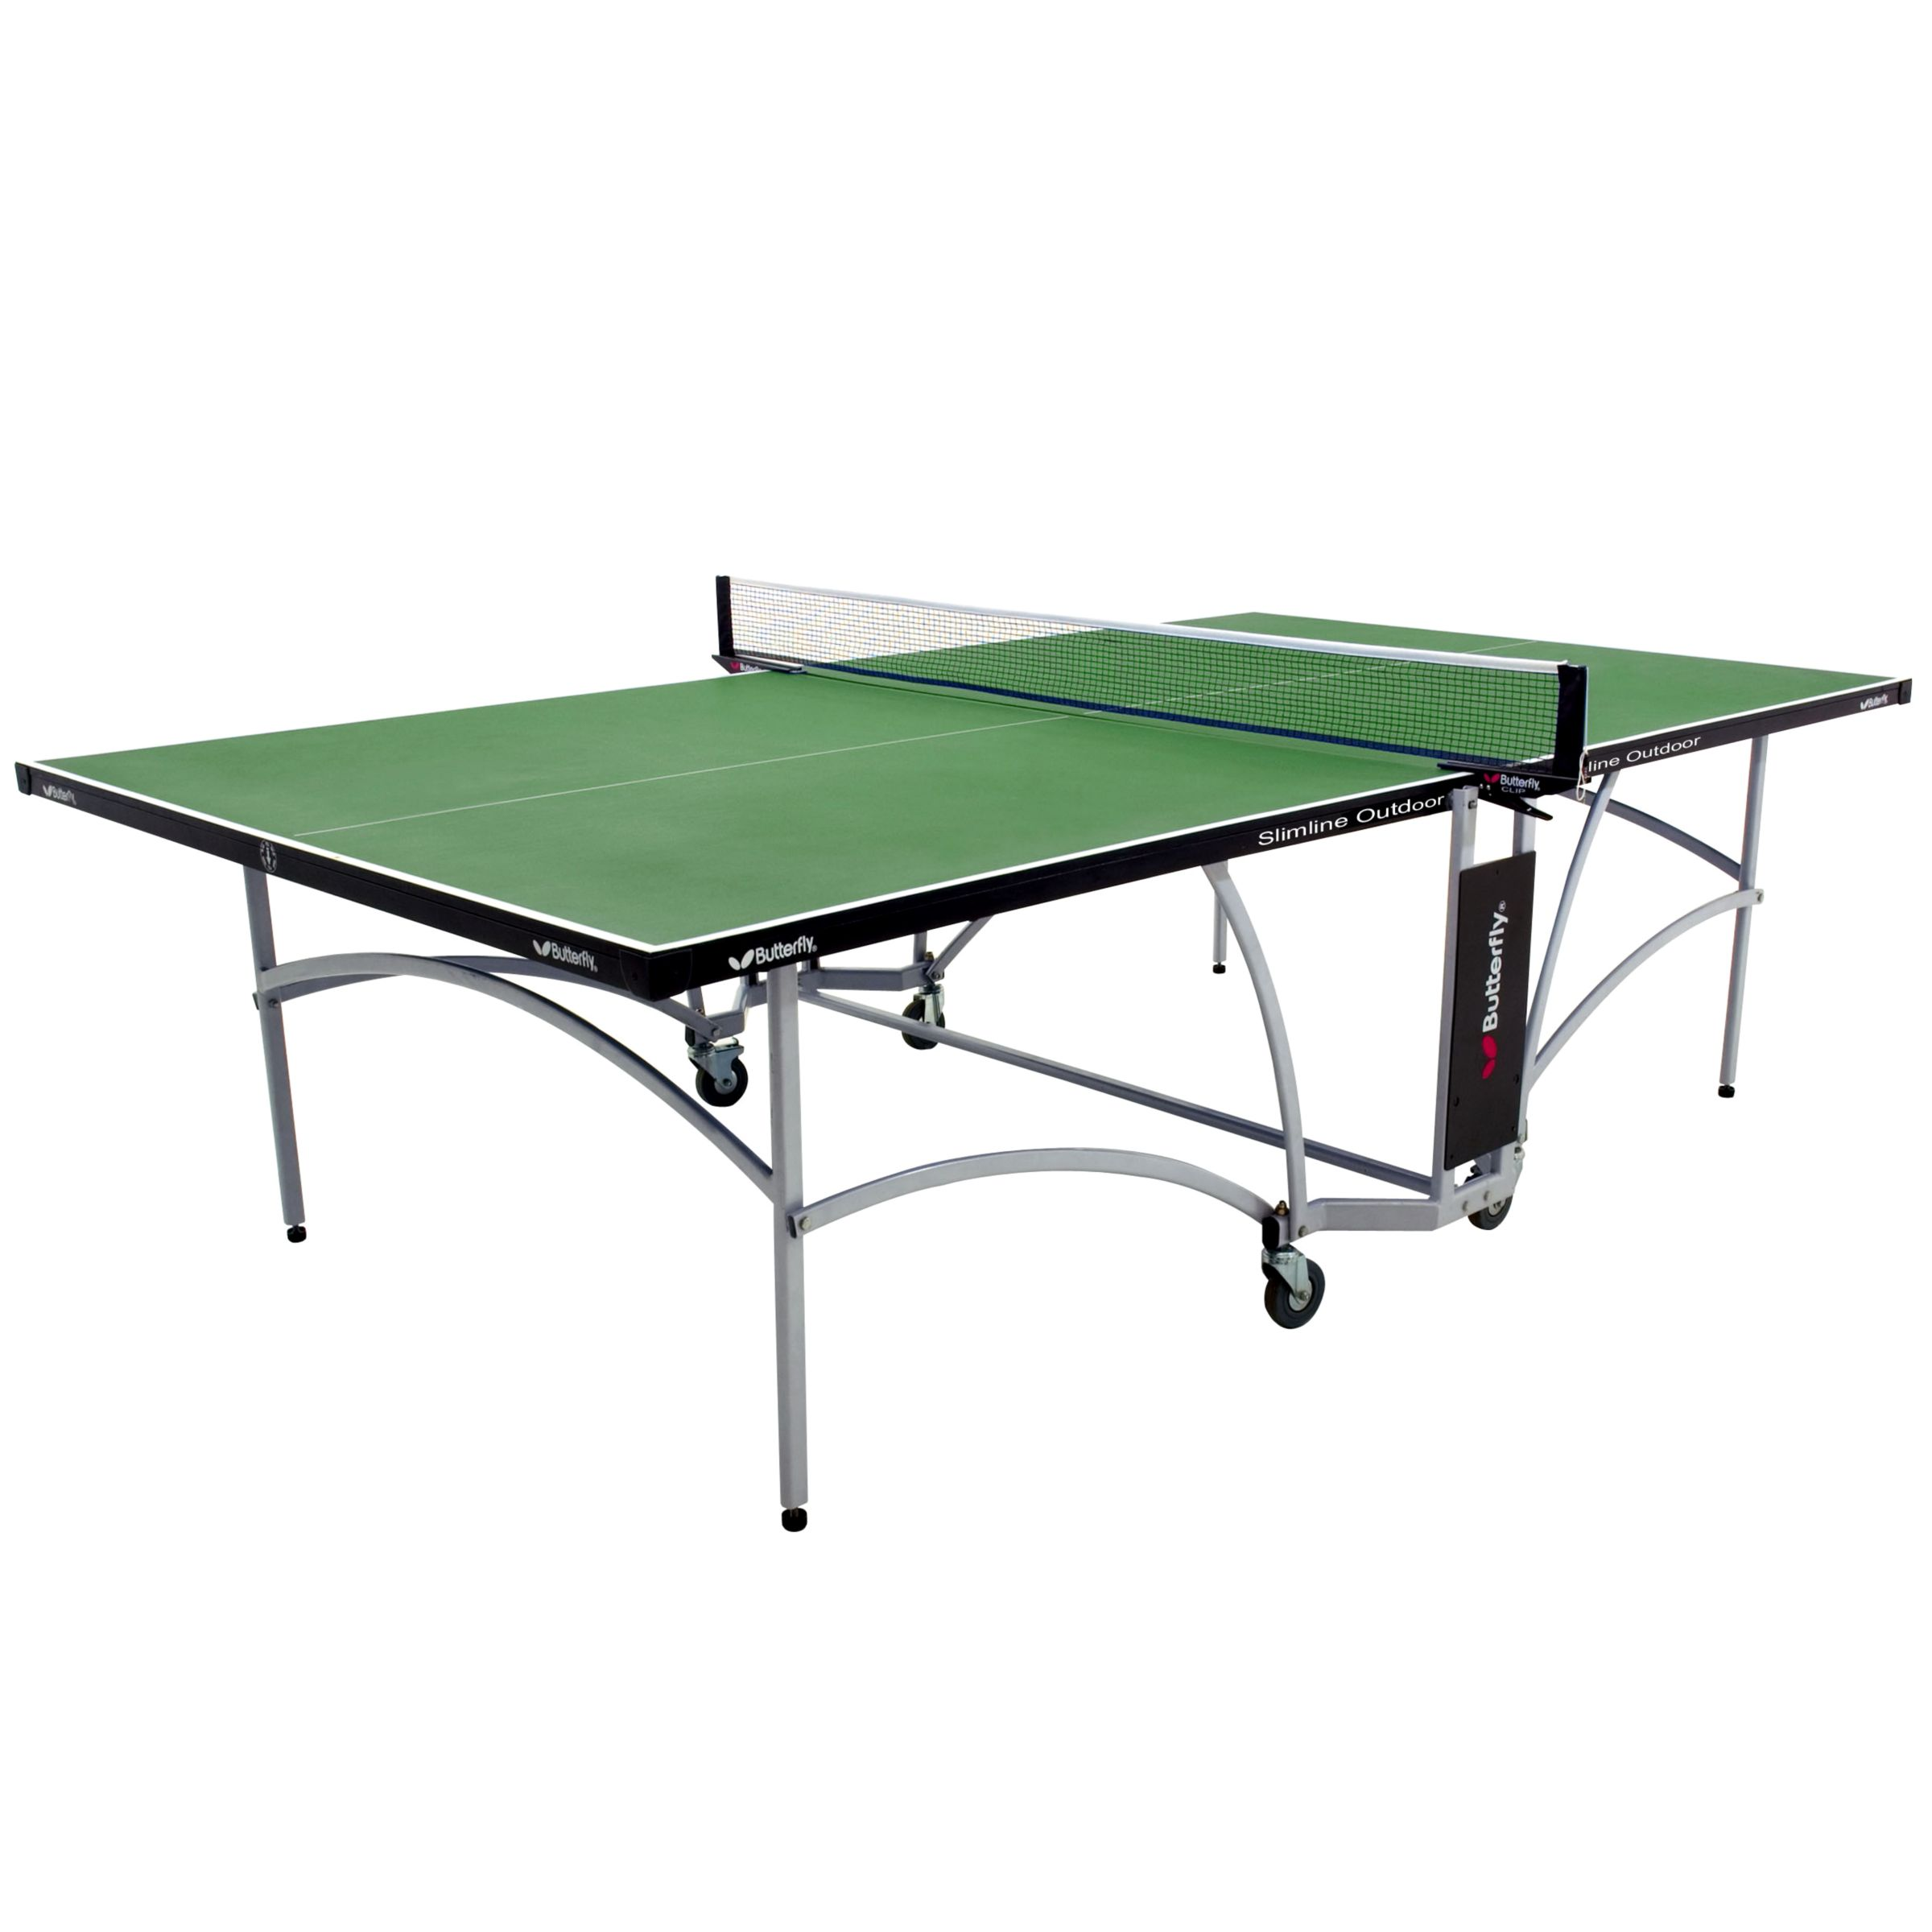 Butterfly Butterfly Slimline Outdoor Table Tennis Table, Green